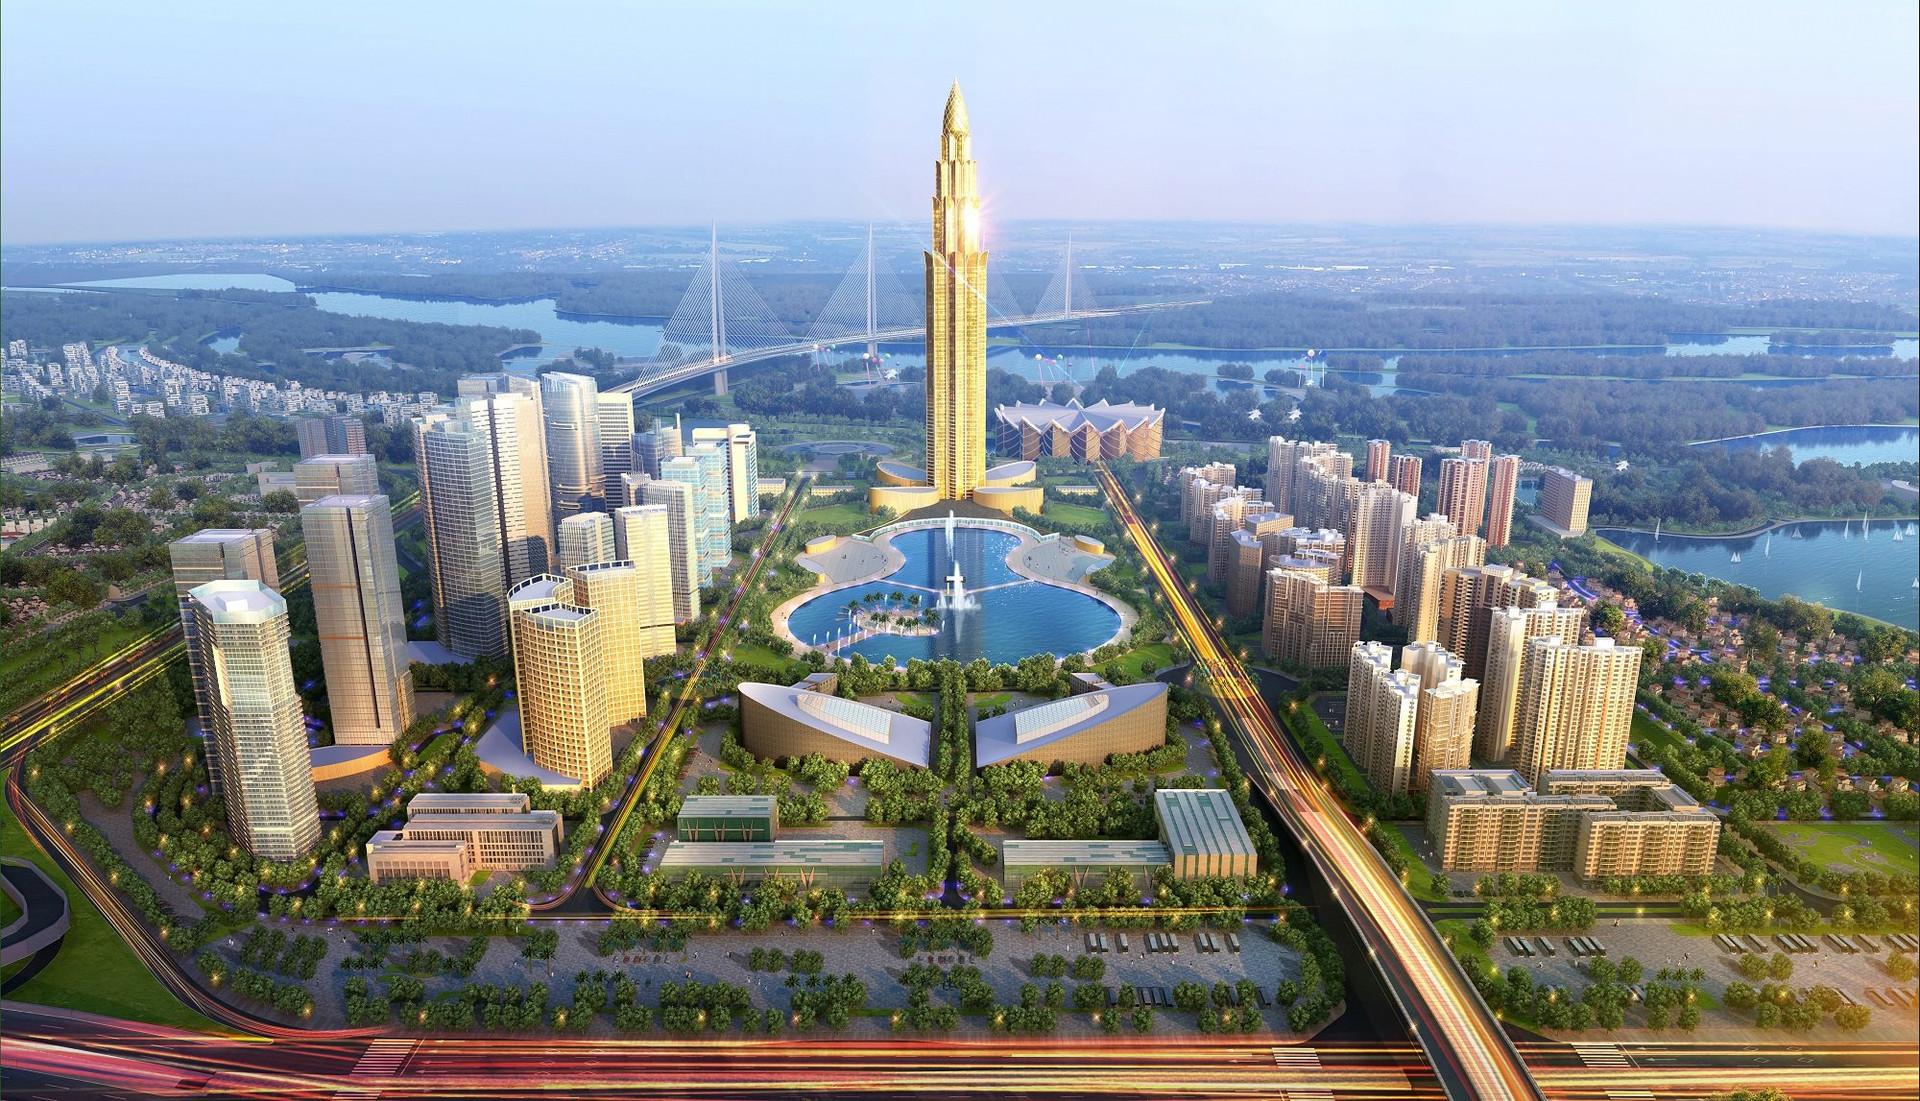 01-phoi-canh-smart-city.jpg